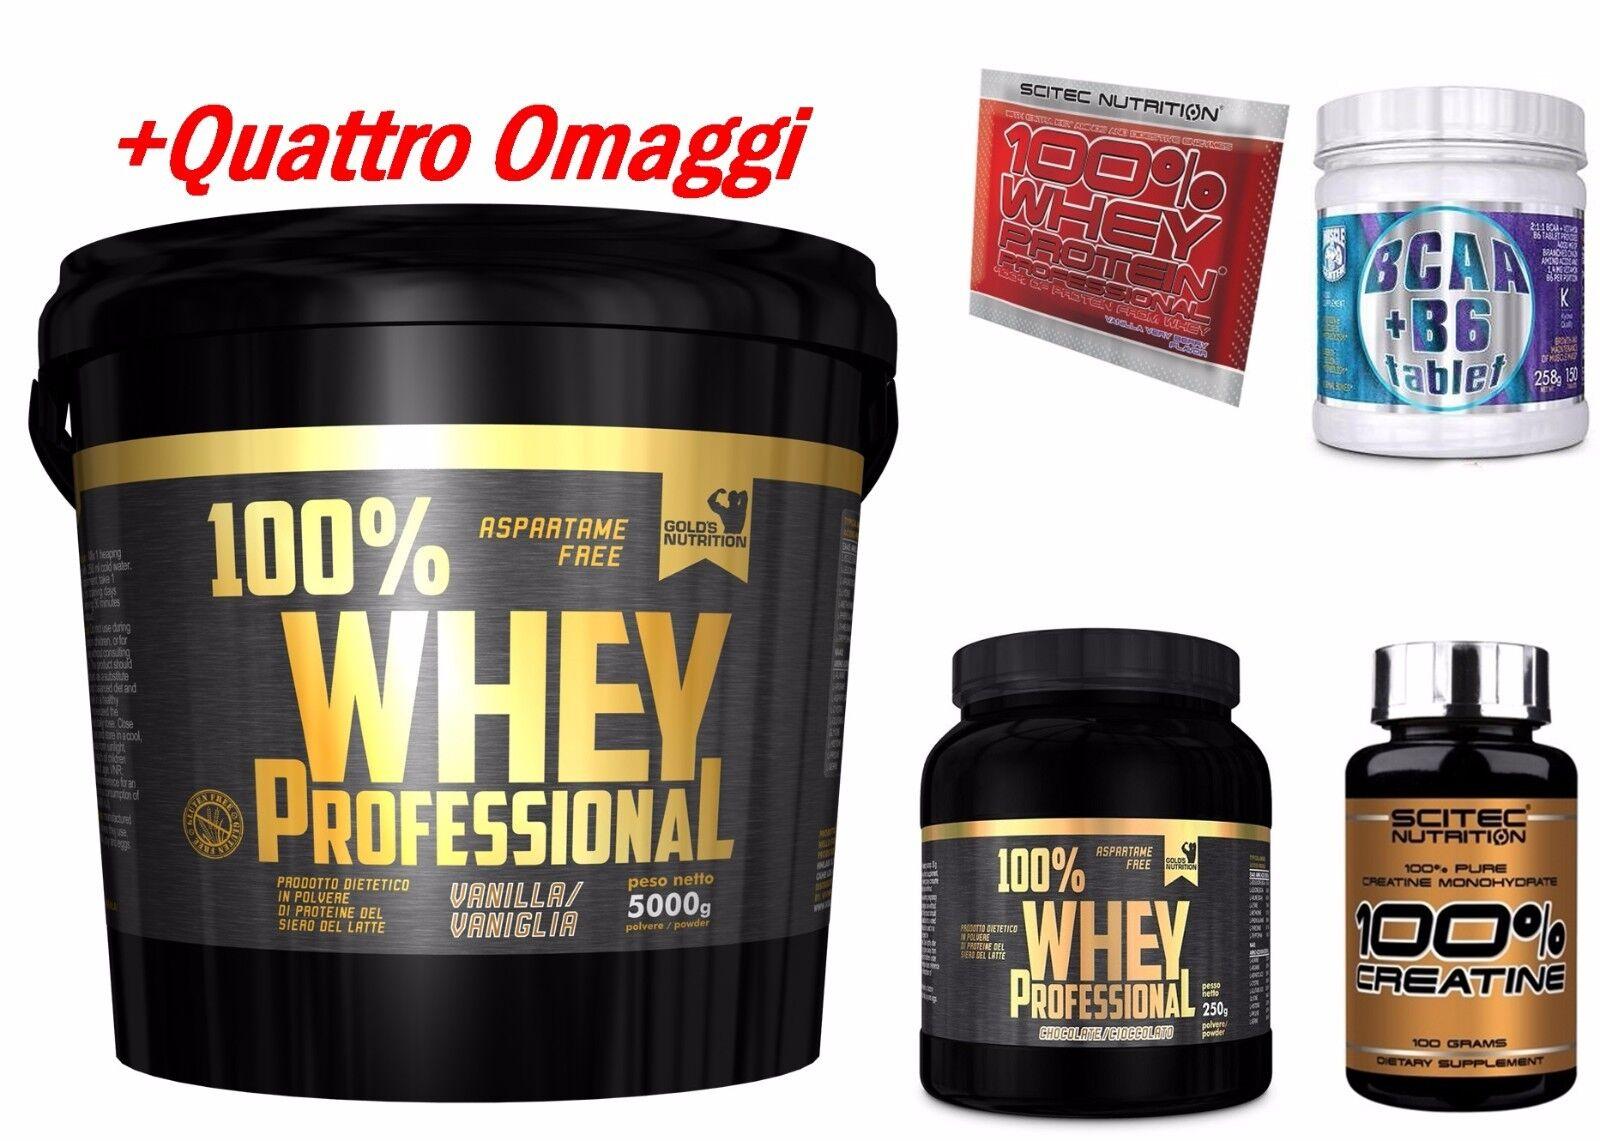 Gold's Nutrition 100% whey protein siero vaniglia 5 kg  bcaa + bcaa  + scitec proteine b6e580